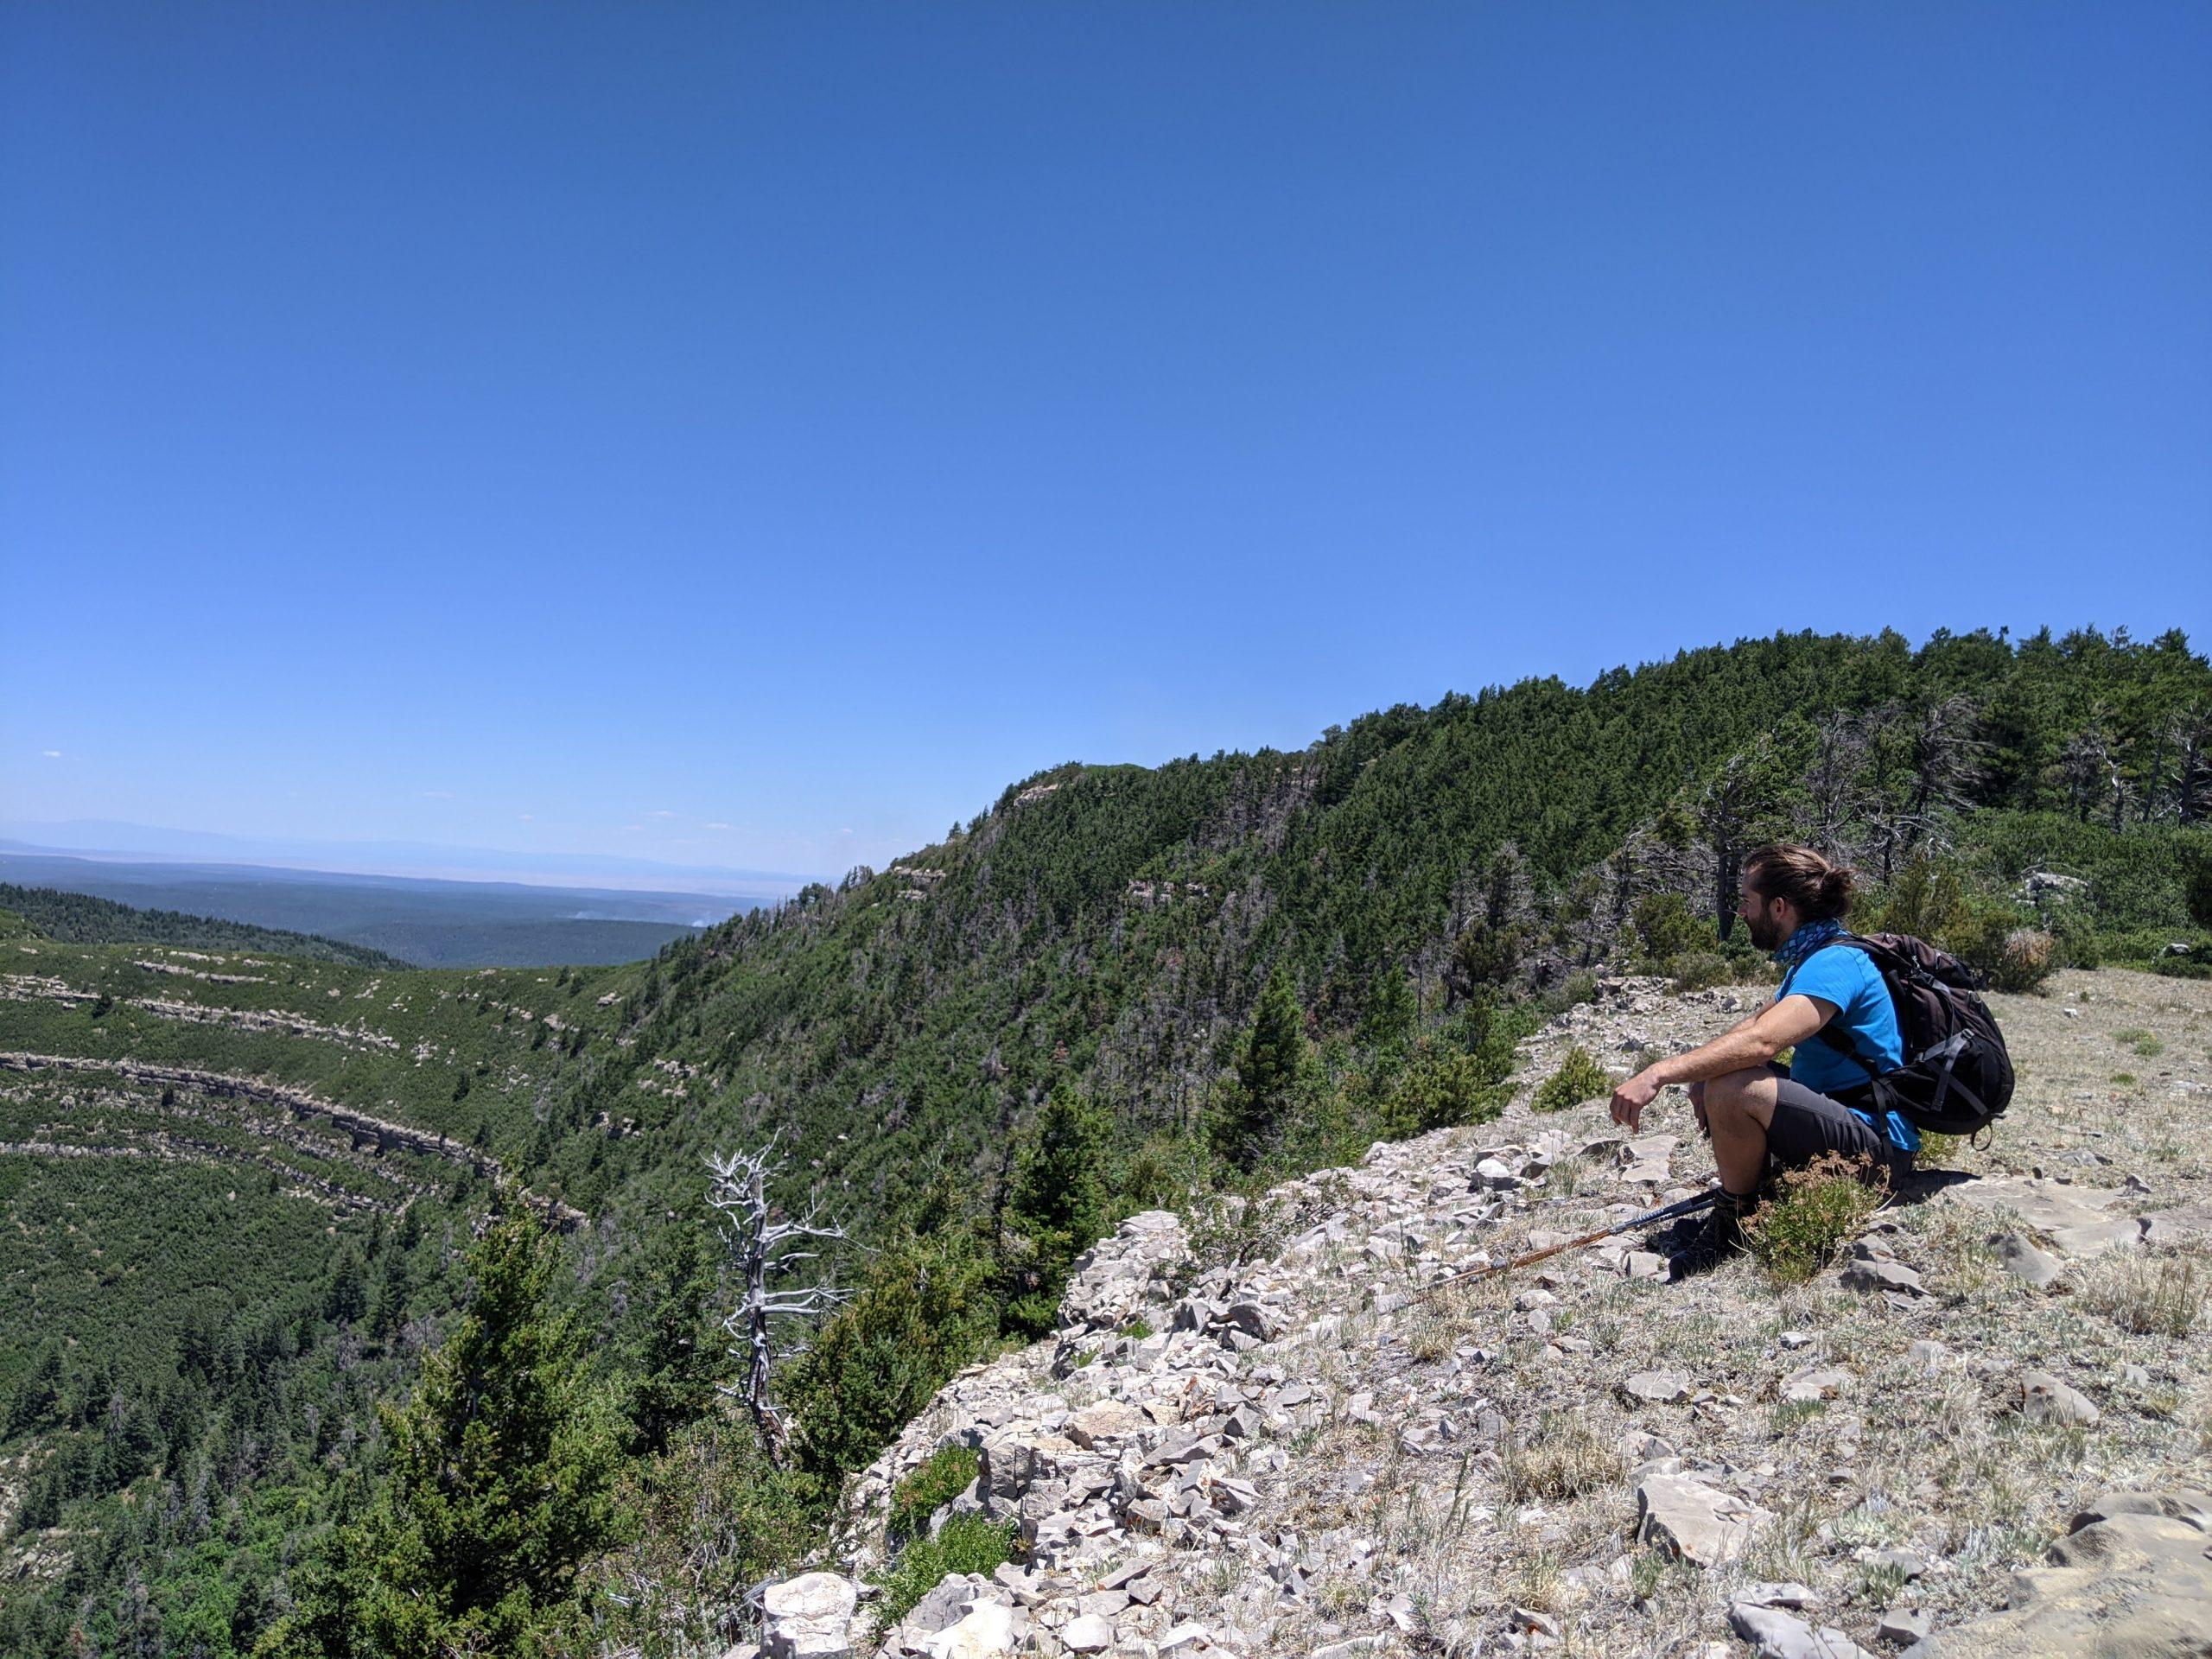 Solitude Monitoring in the Sandia Mountain Wilderness